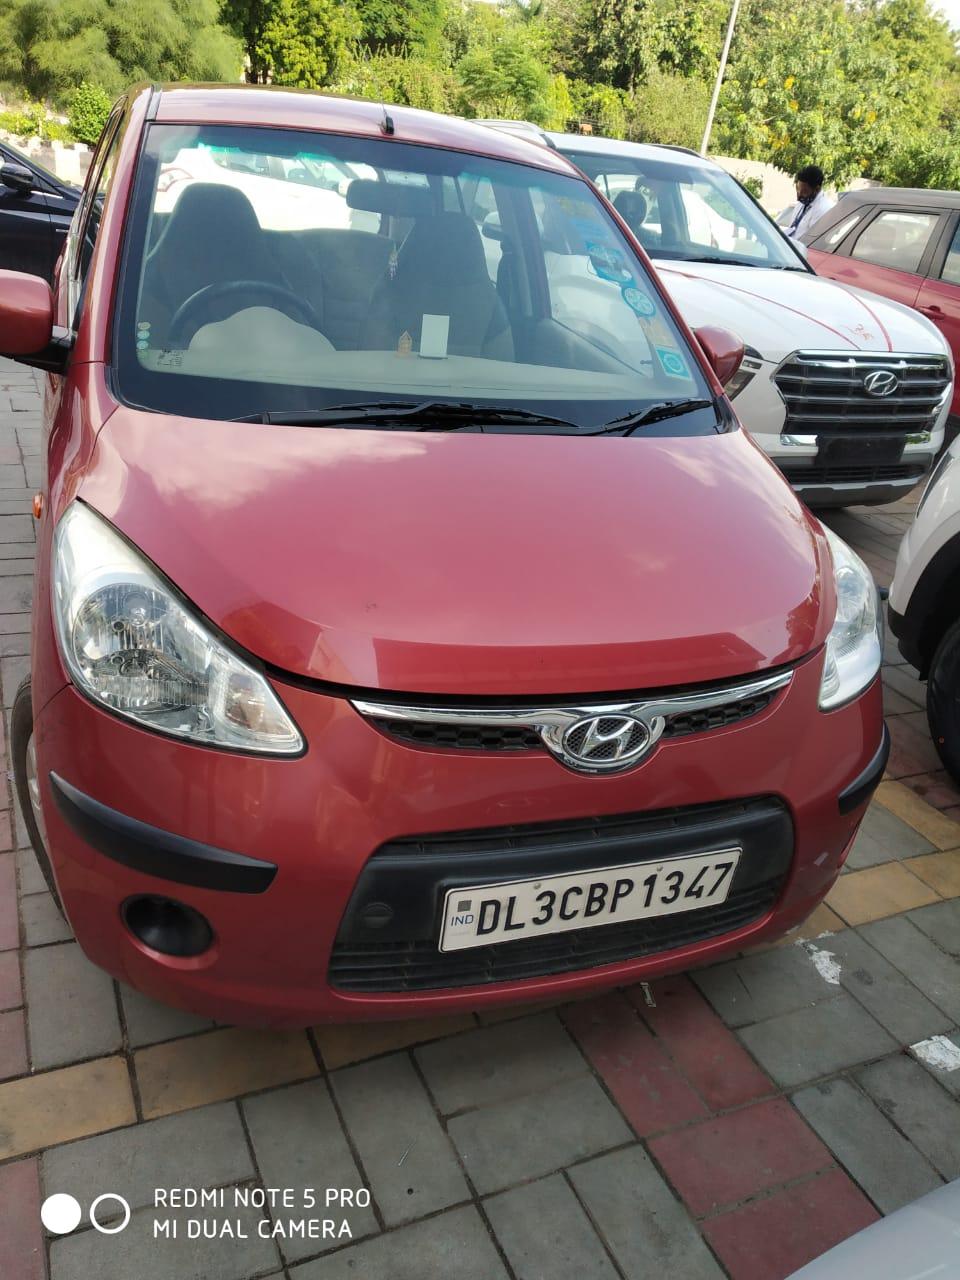 2012 Used Hyundai I10 MAGNA 1.1 IRDE2